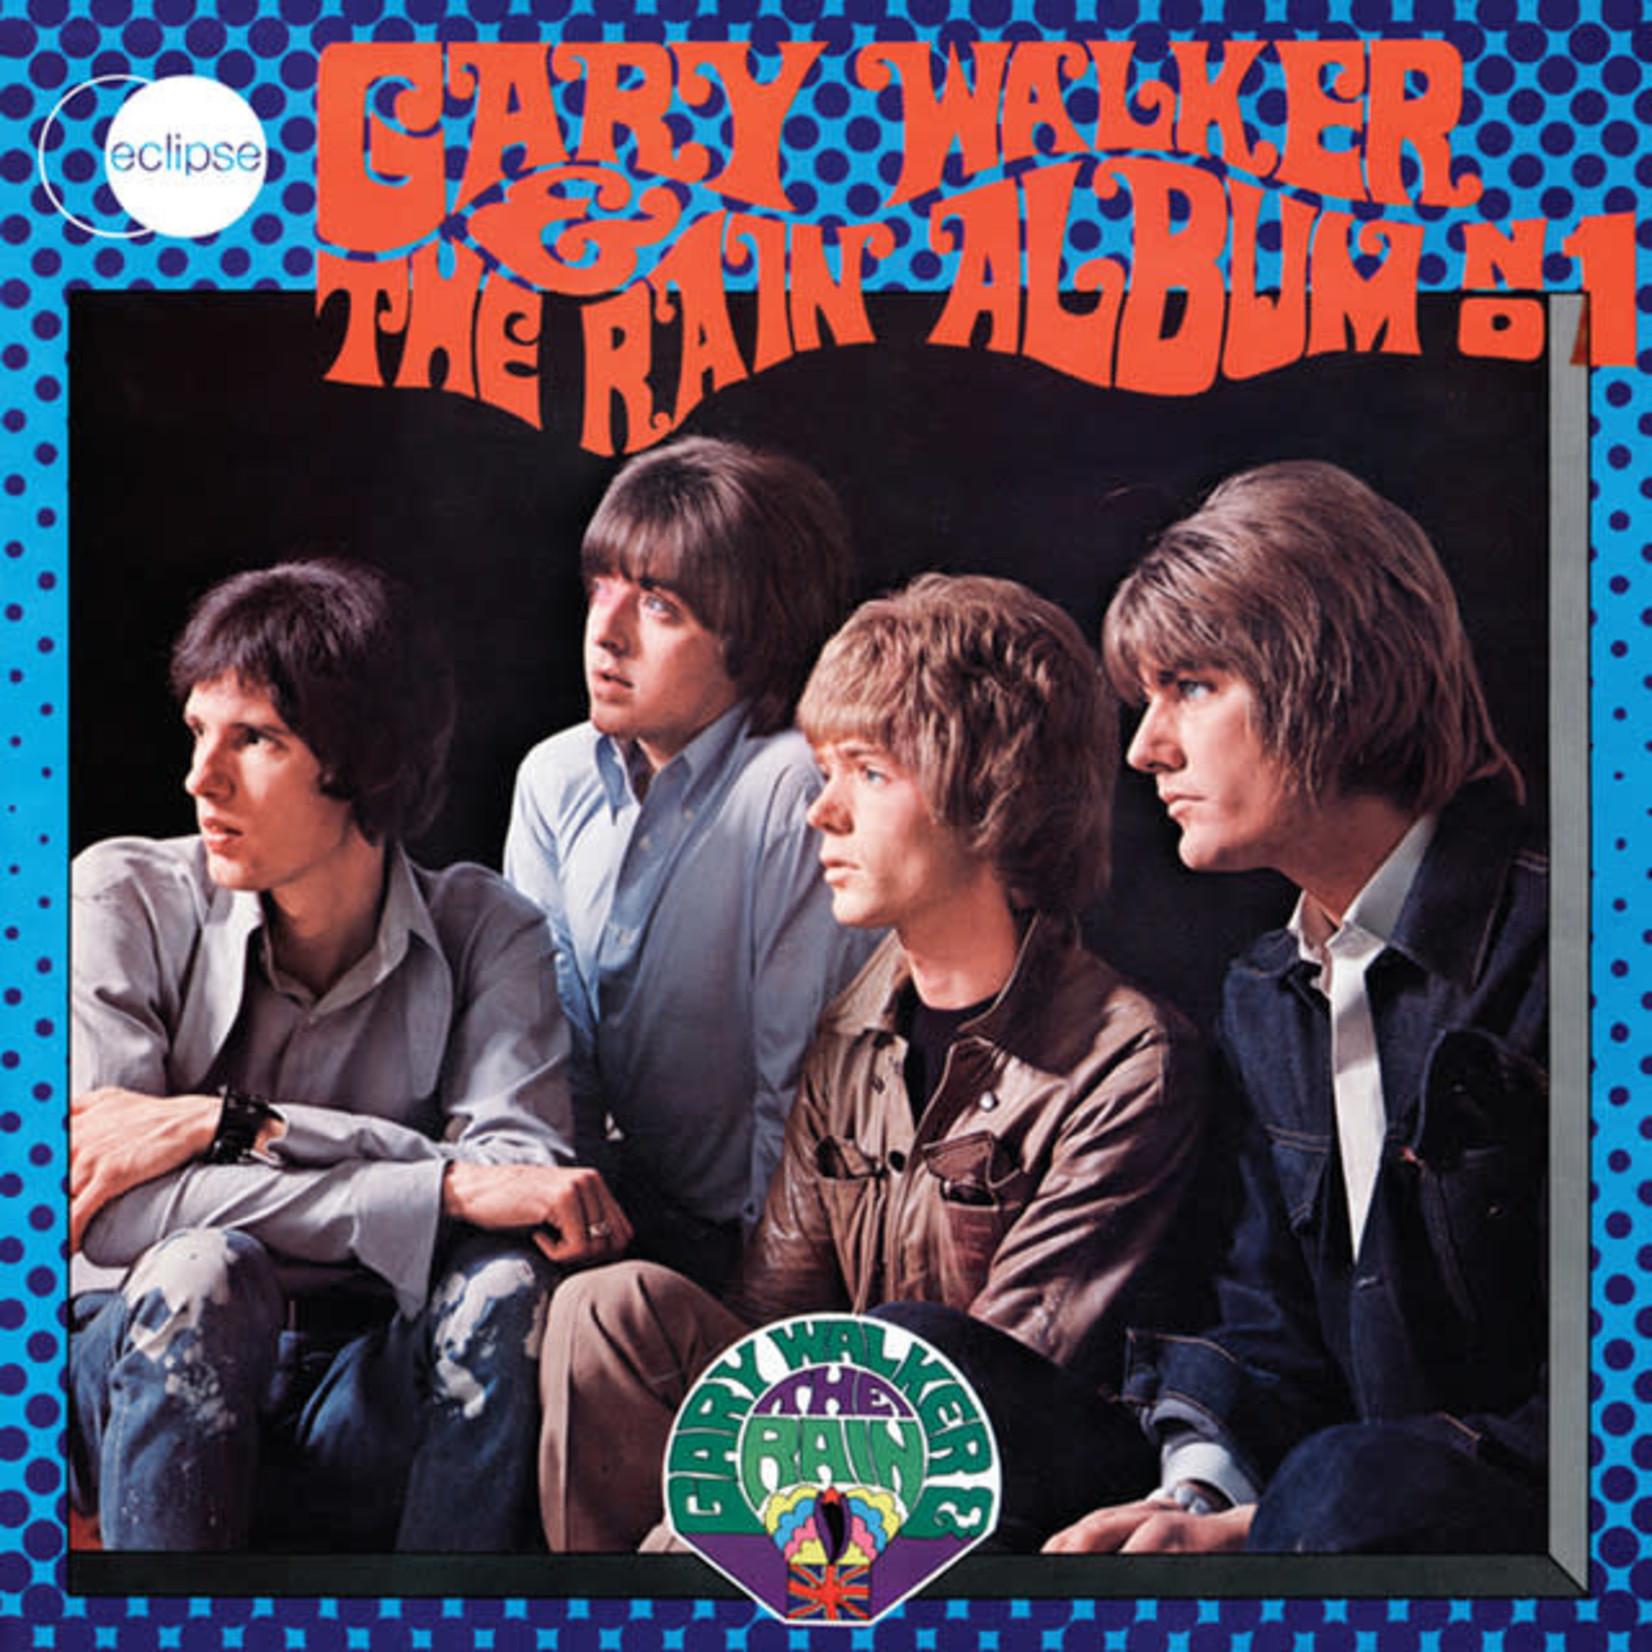 Vinyl Gary Walker & The Rain - Album No. 1